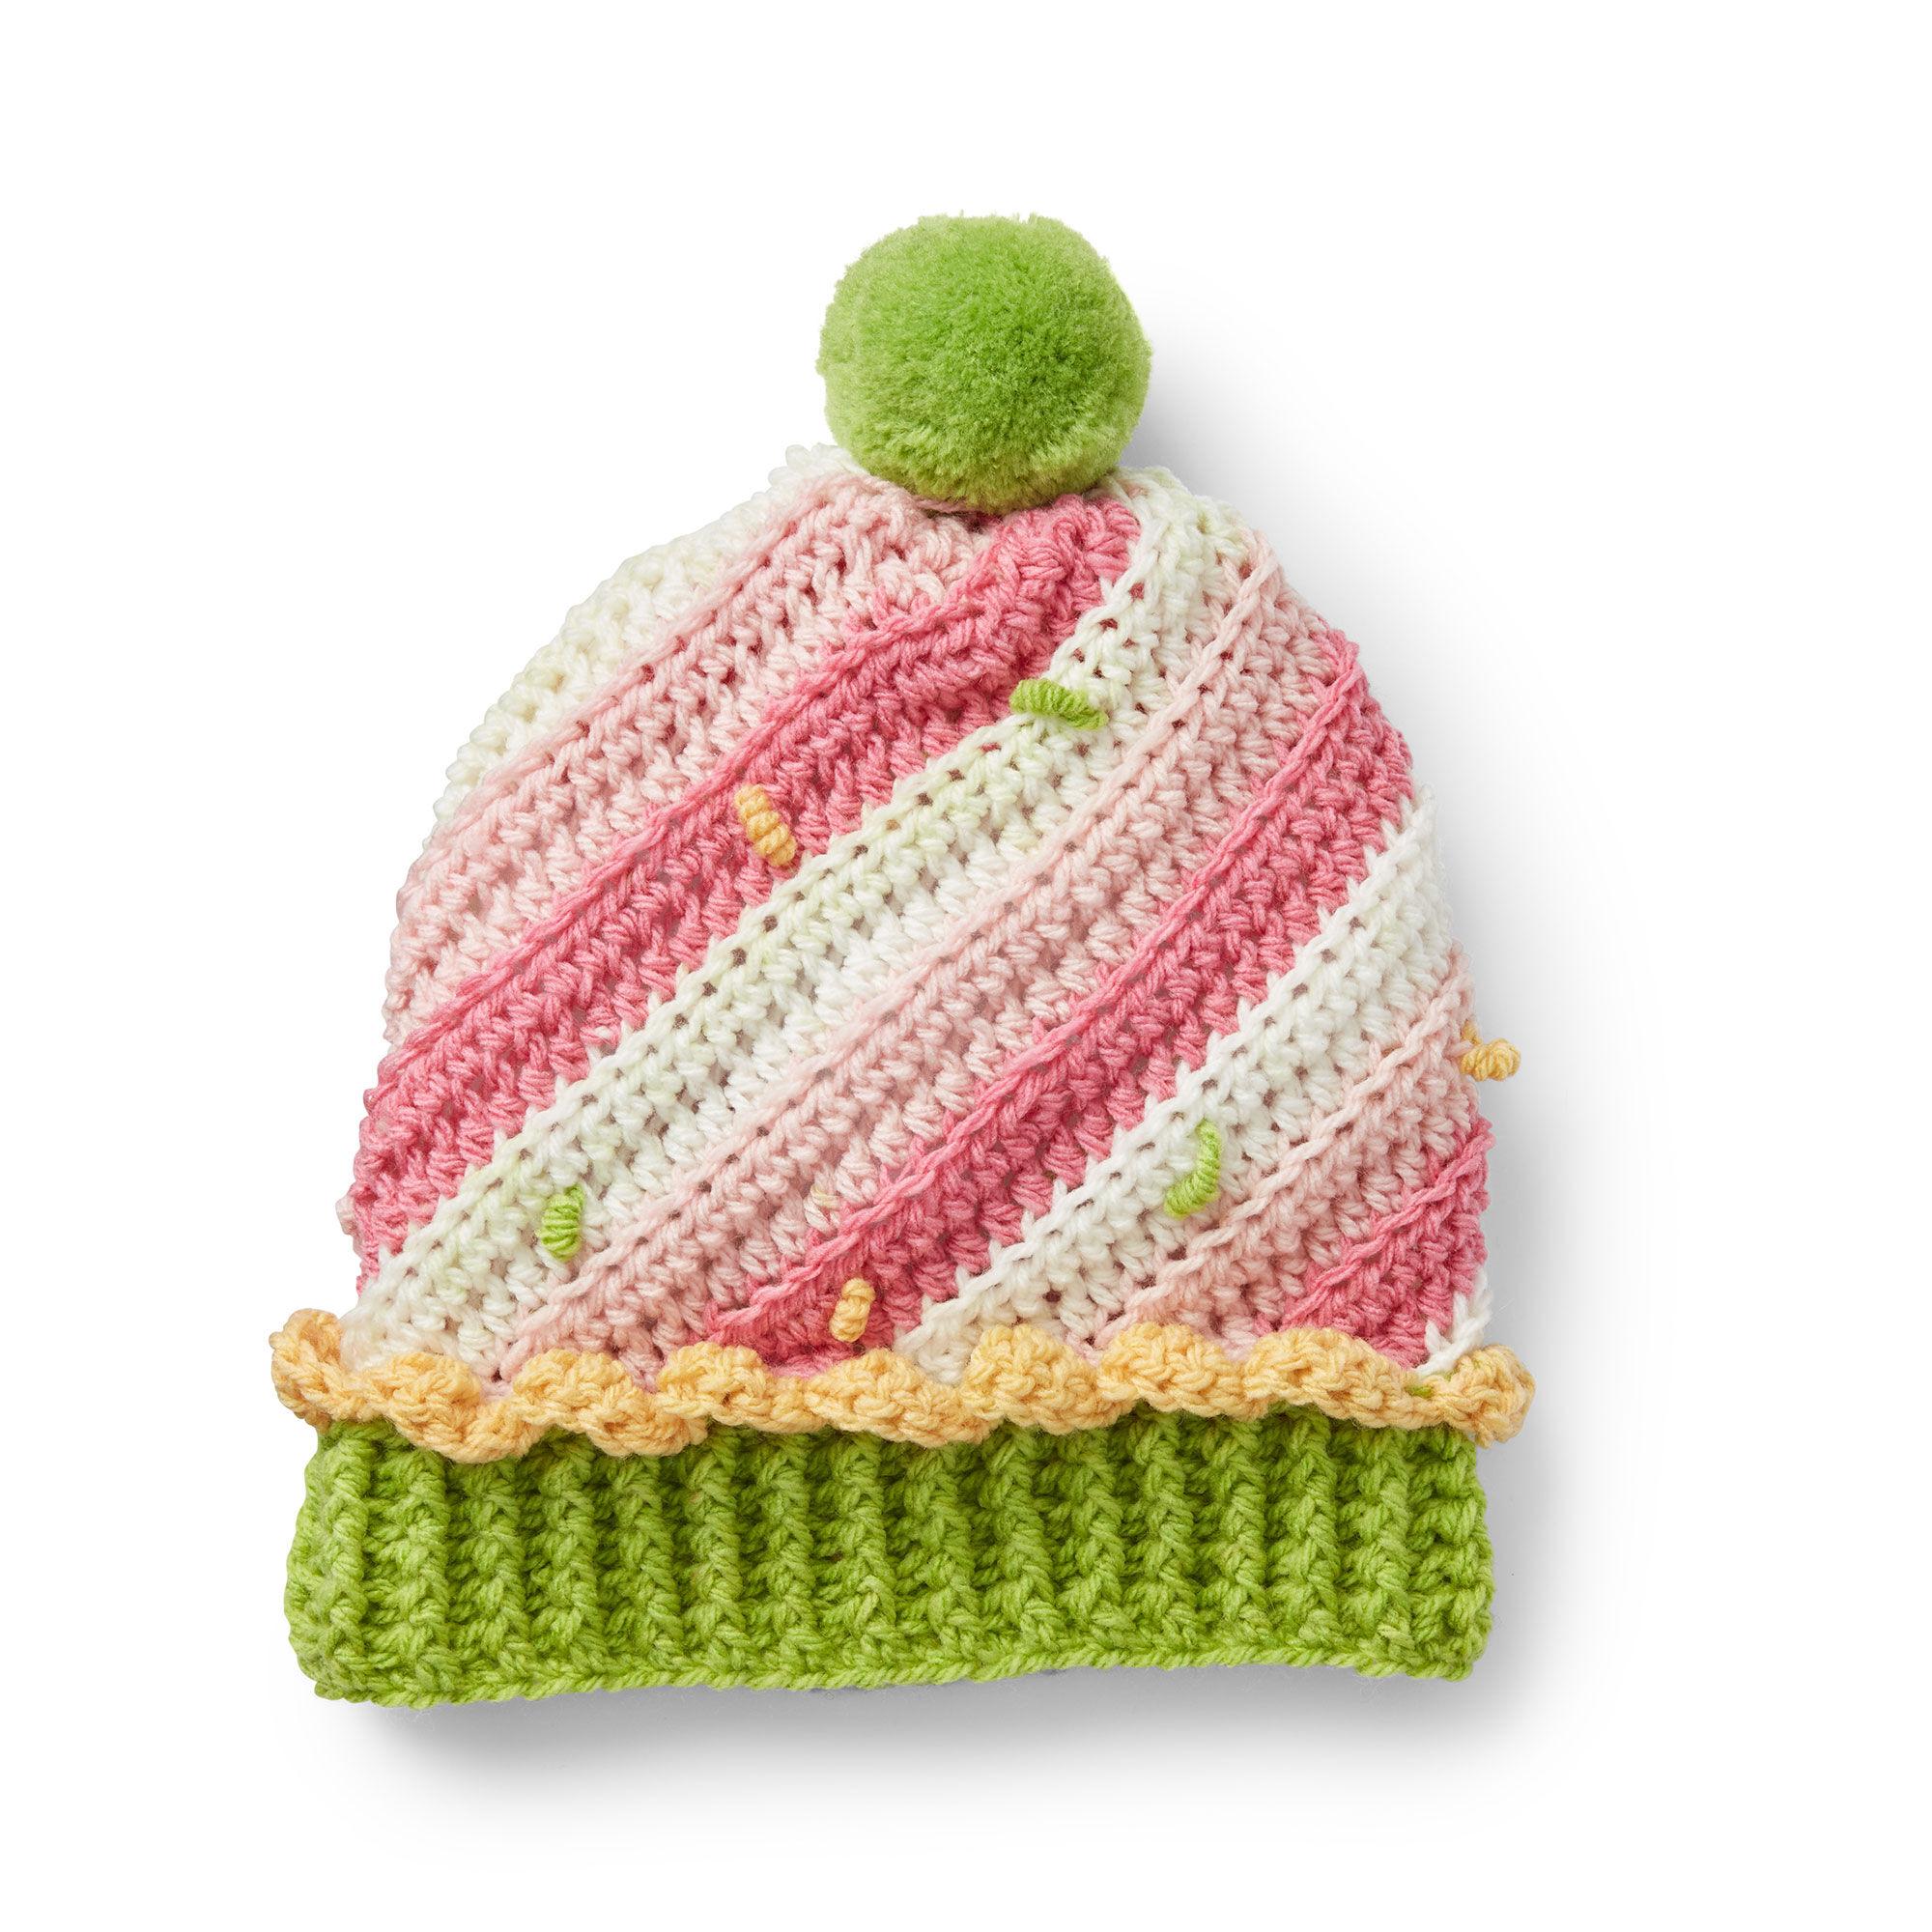 More Inspirational Images. Caron Sweet Swirl Crochet Cupcake Hat ... 65909219090